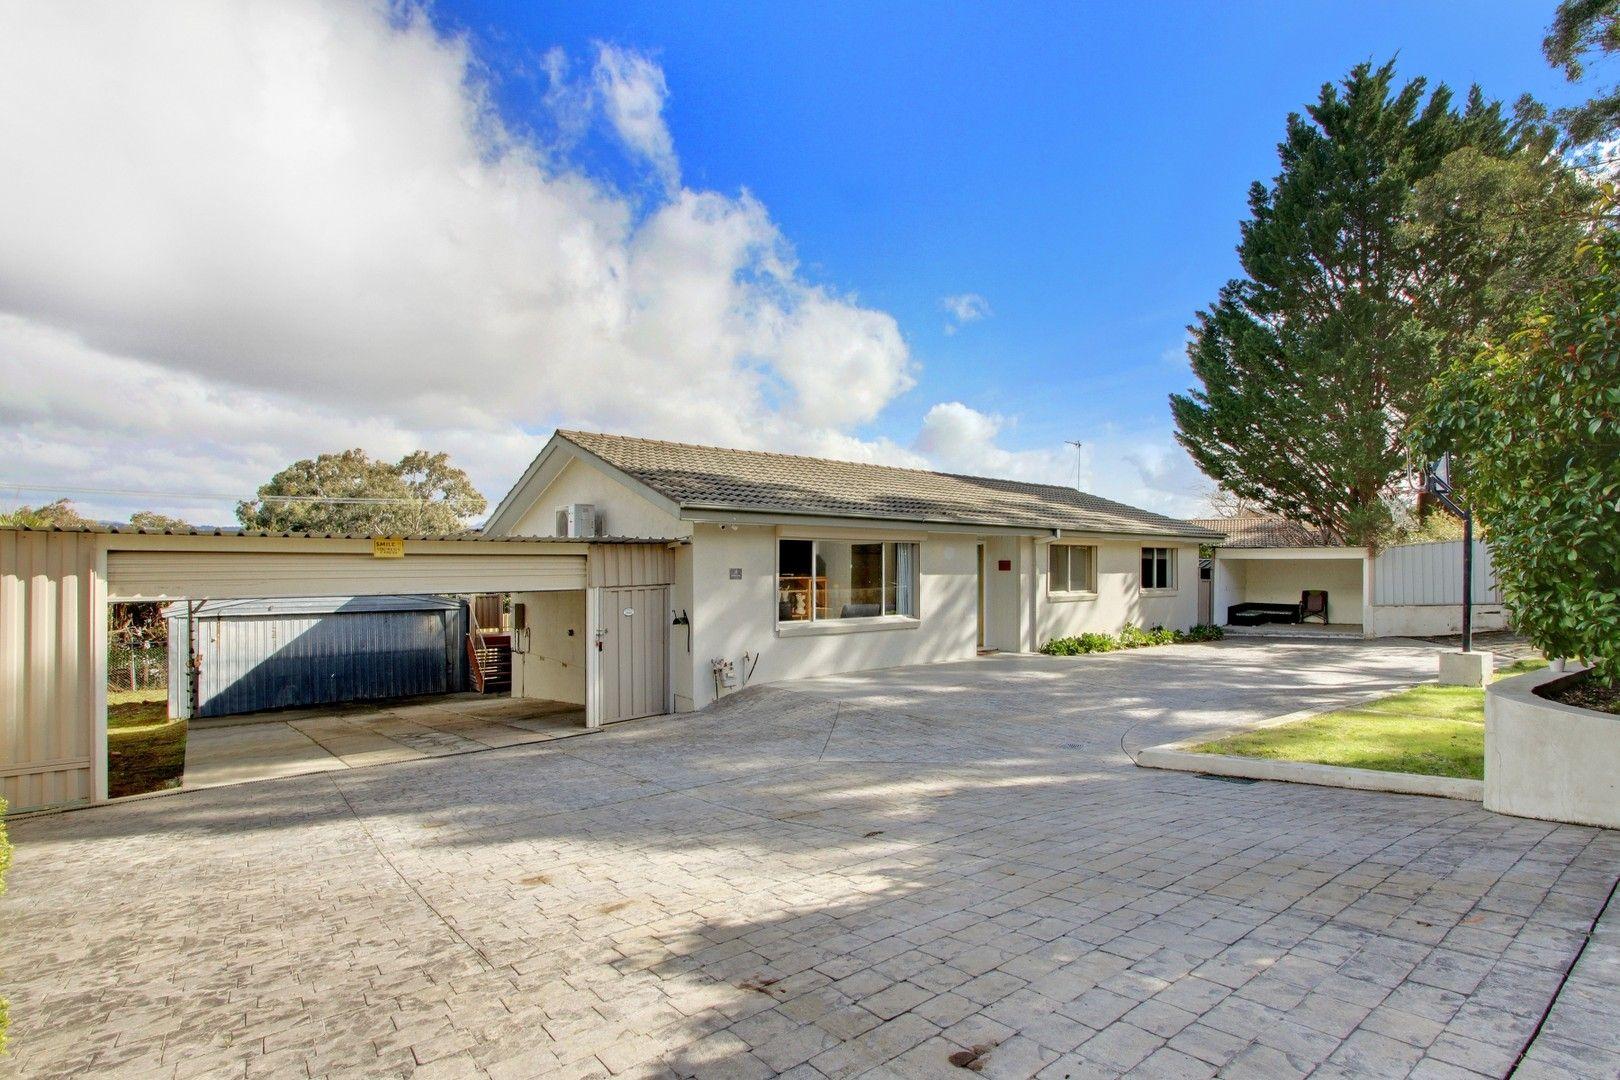 3 bedrooms House in 31 Cuthbert Circuit WANNIASSA ACT, 2903